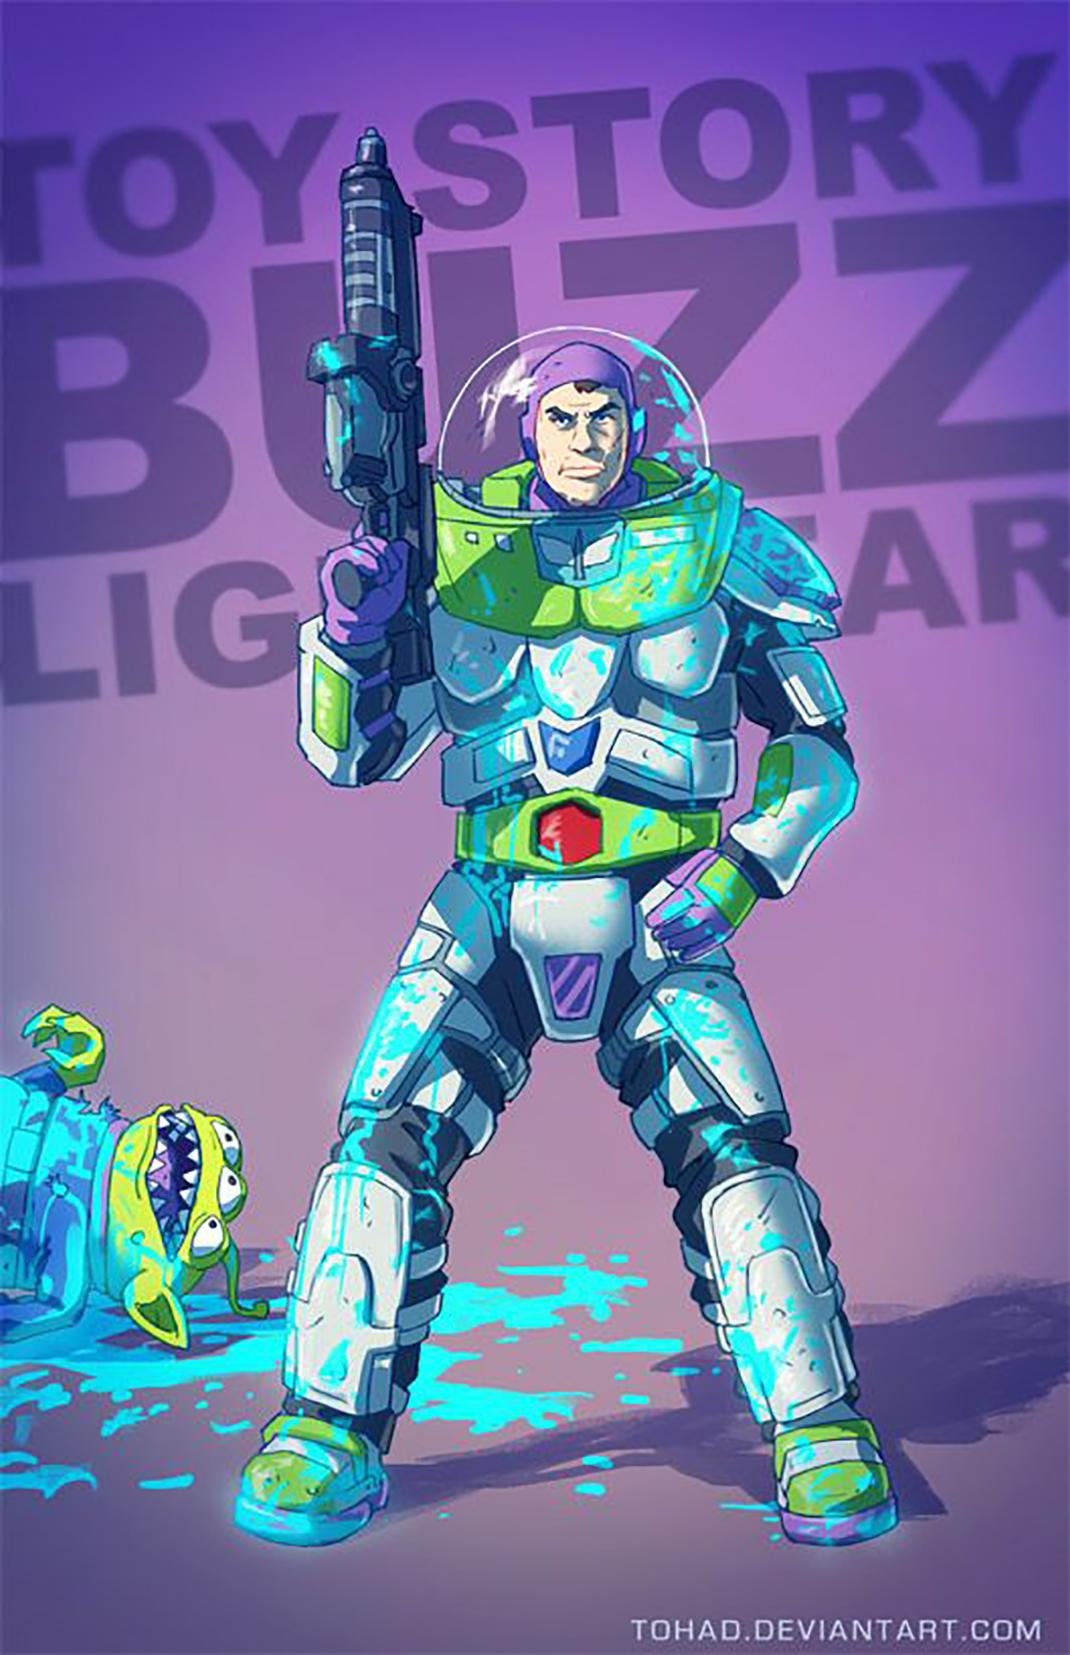 Buzz Leclair